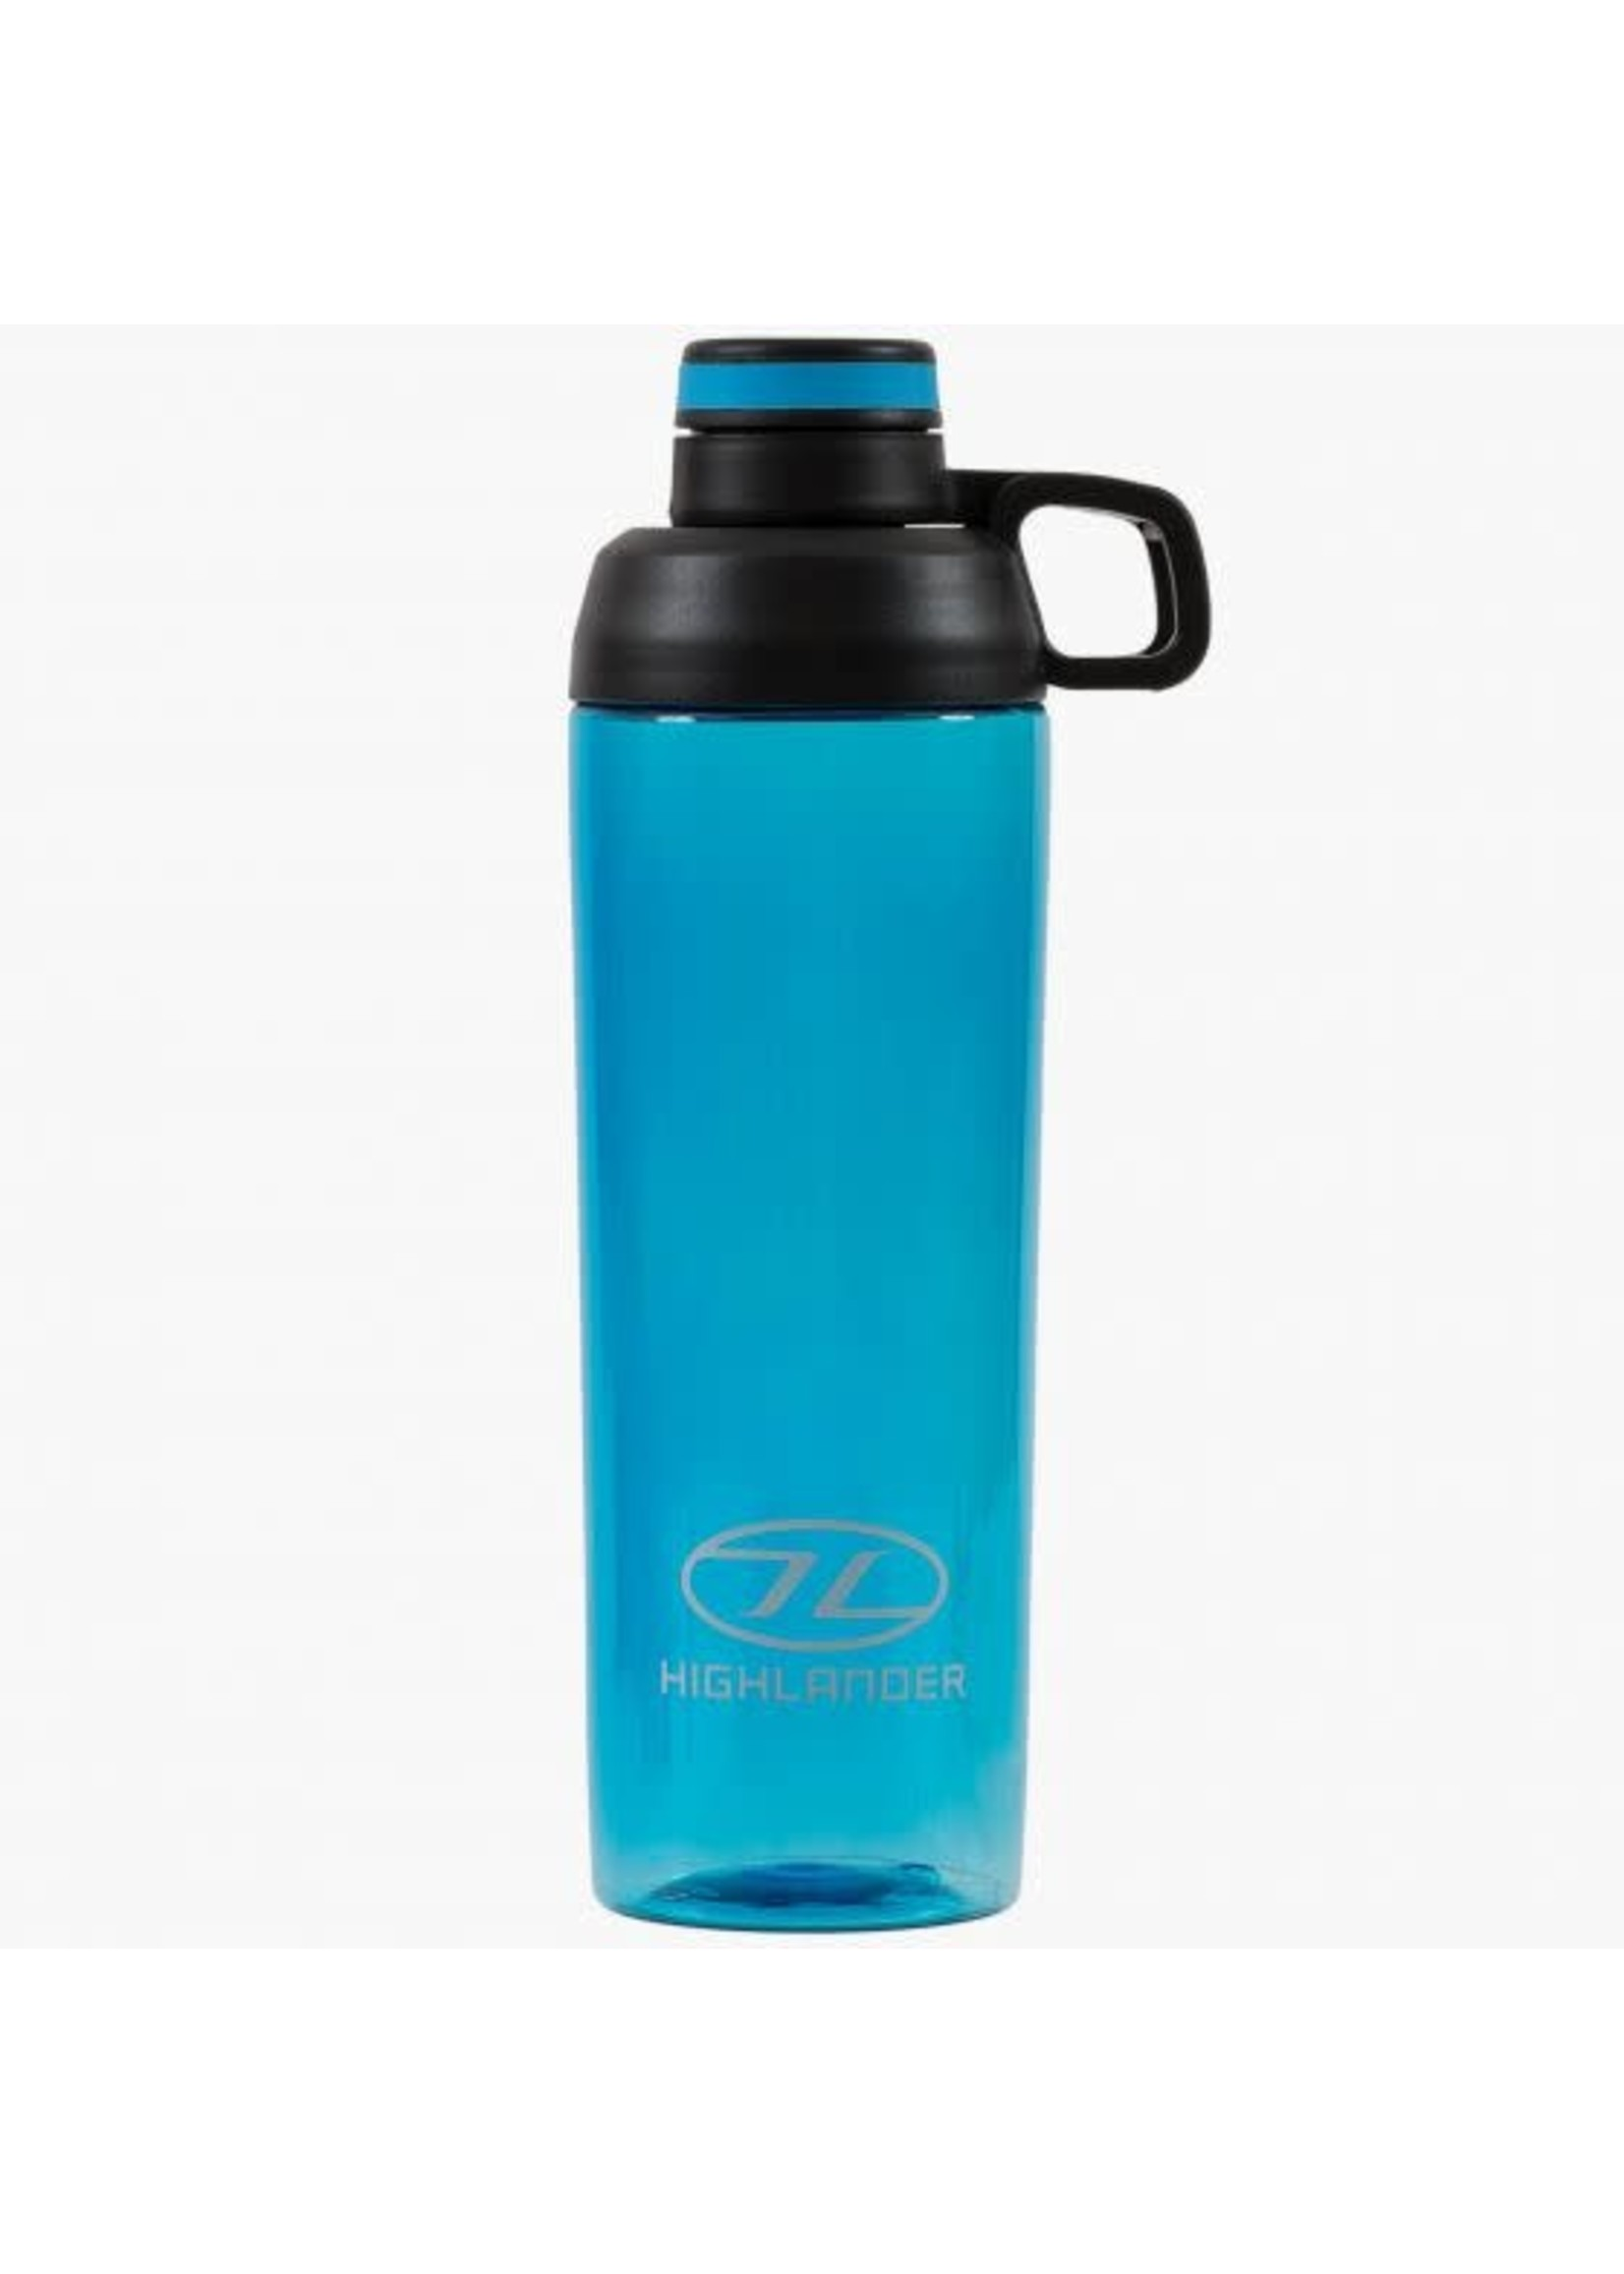 Highlander Highlander 850ml Hydrator Bottle - Various Colours